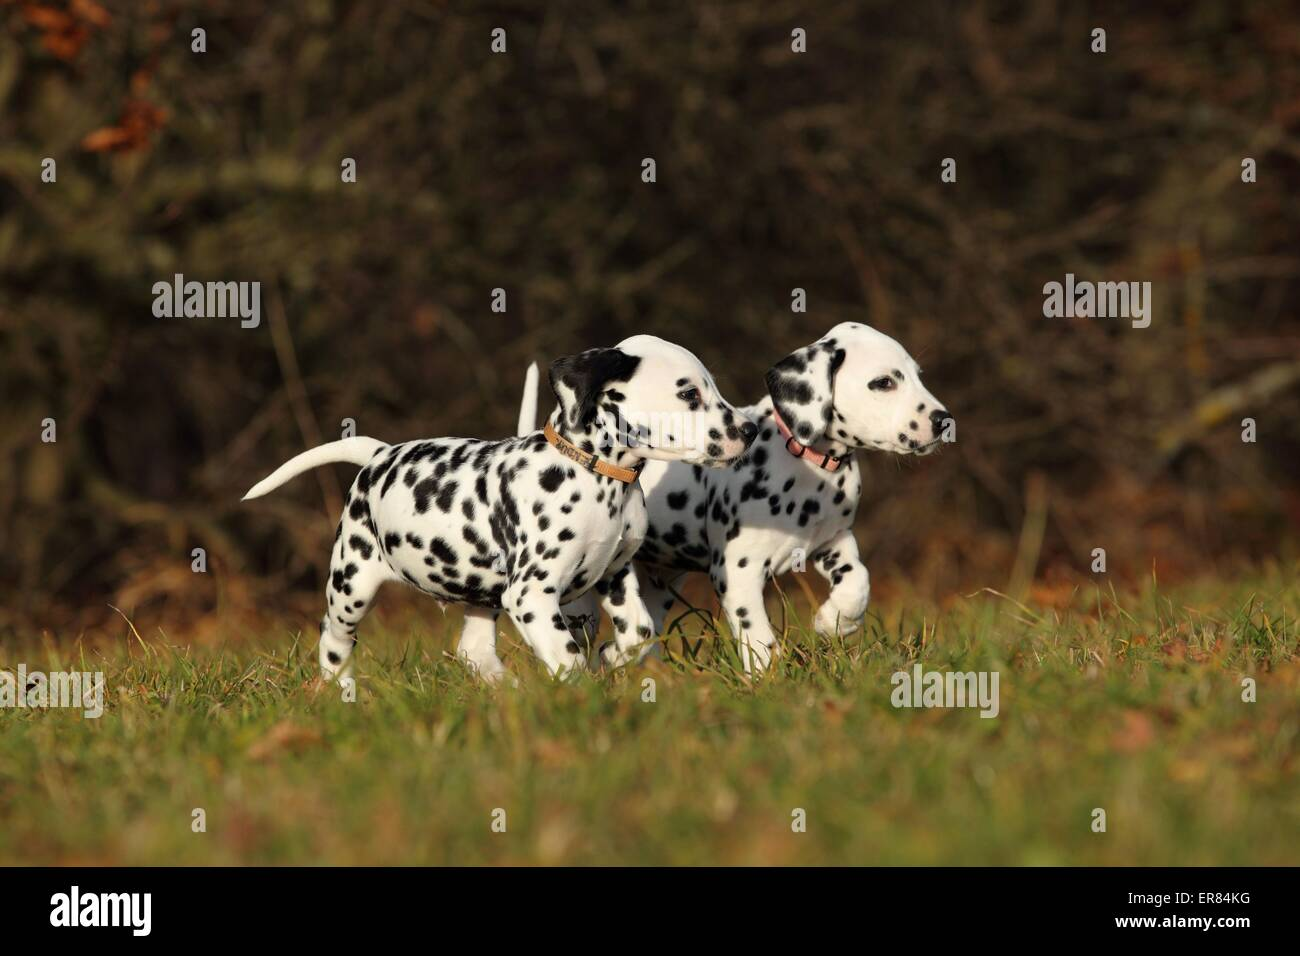 Dalmatian Puppies - Stock Image